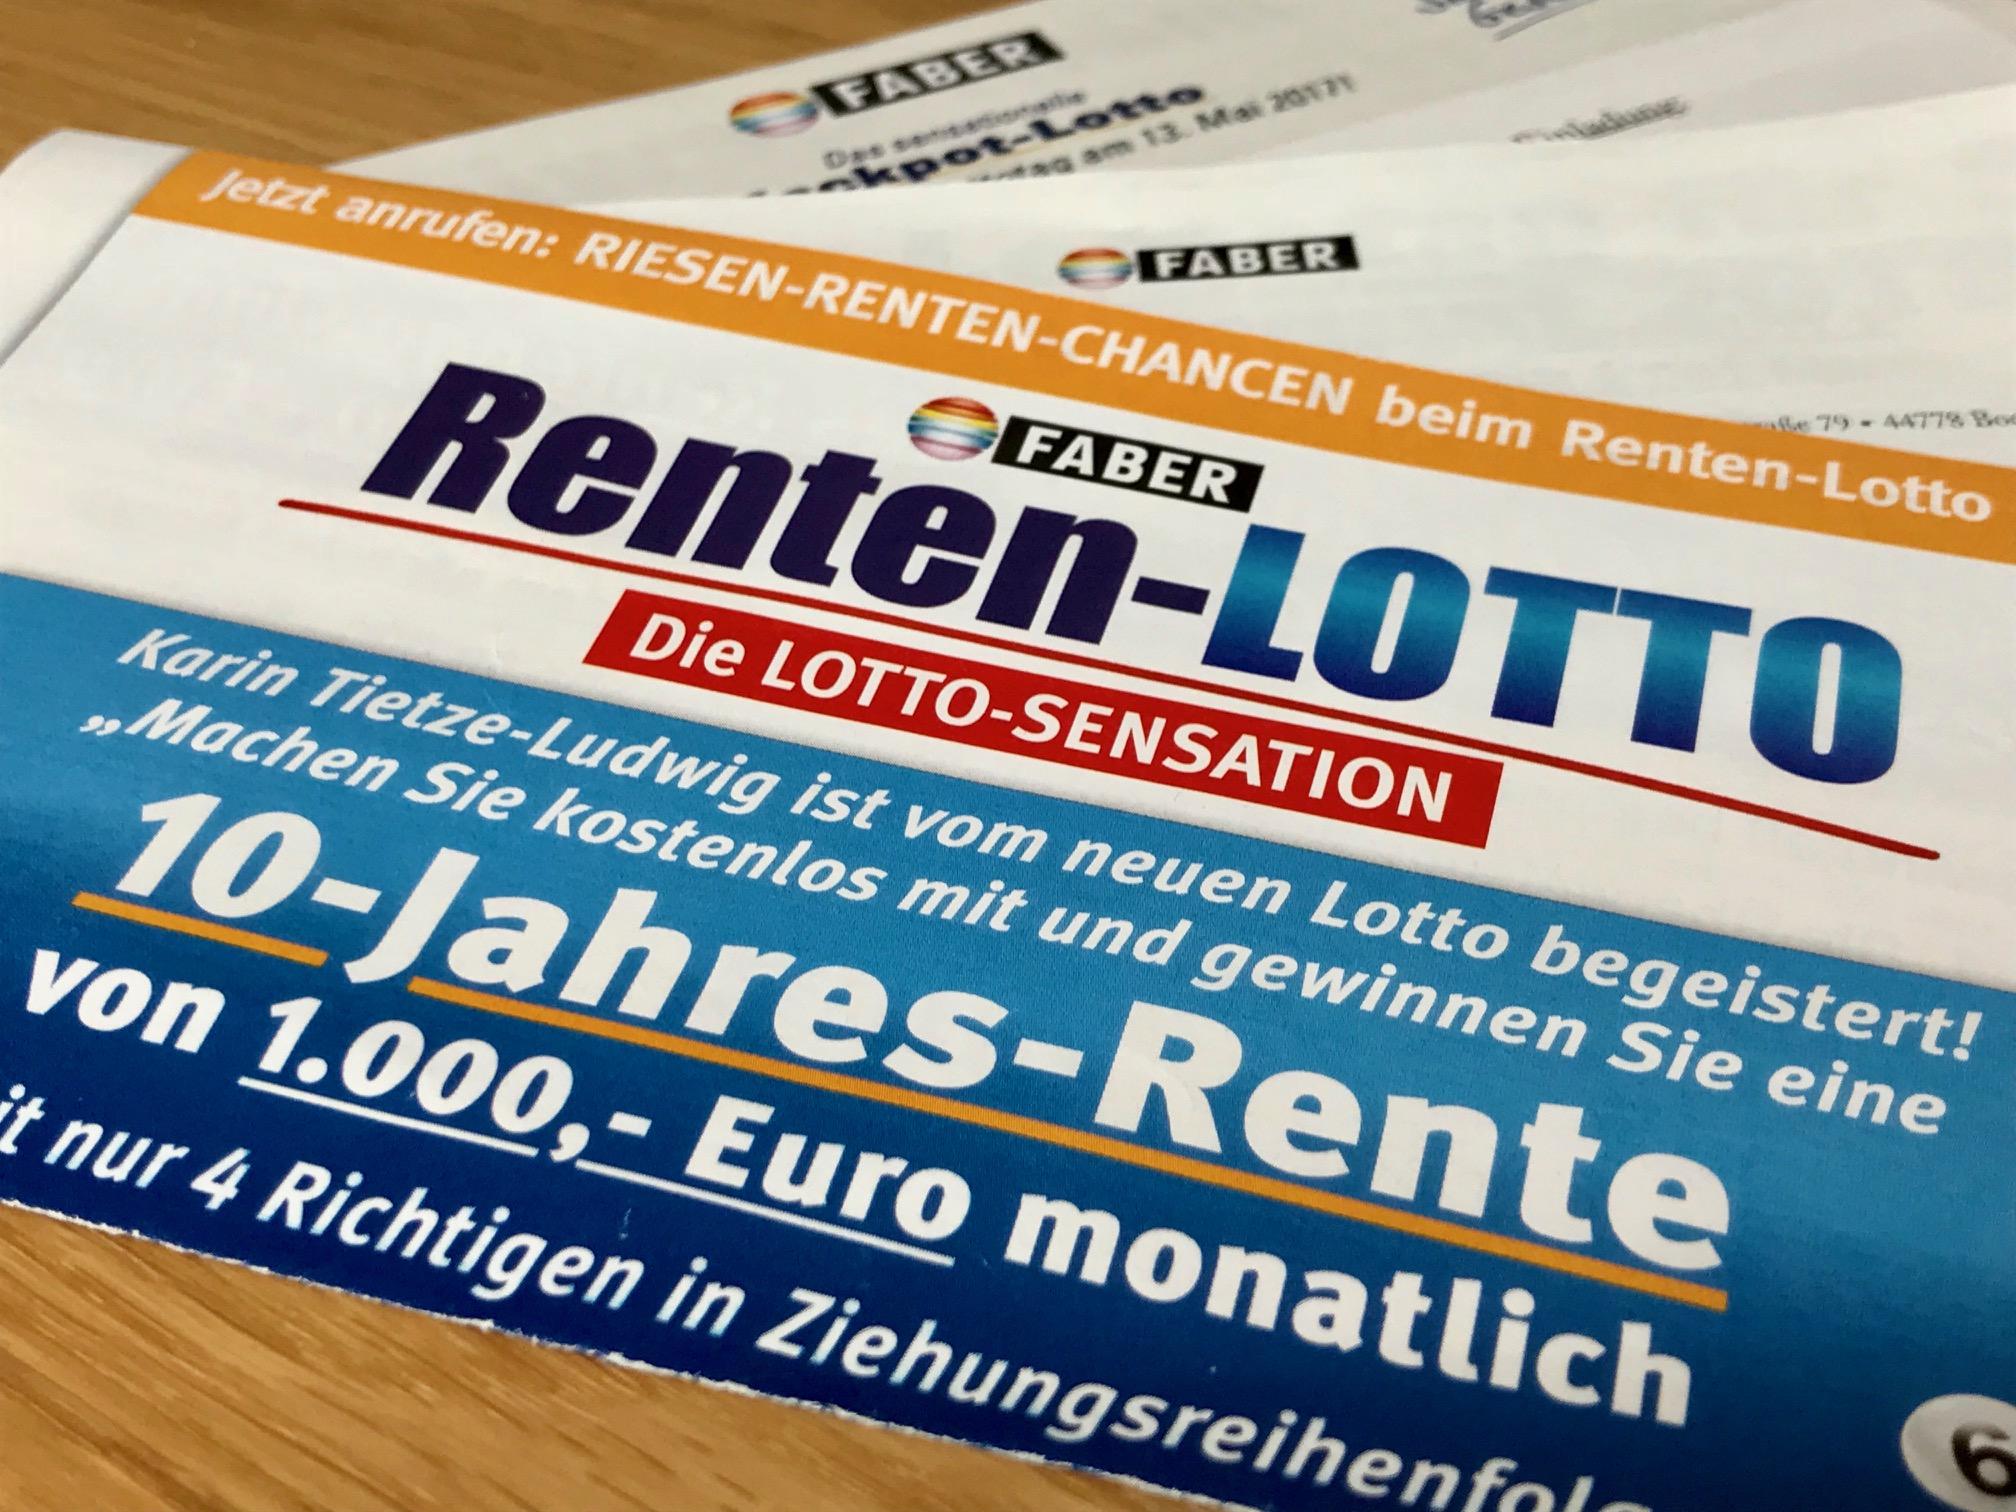 Faber Lotto Positive Erfahrungen